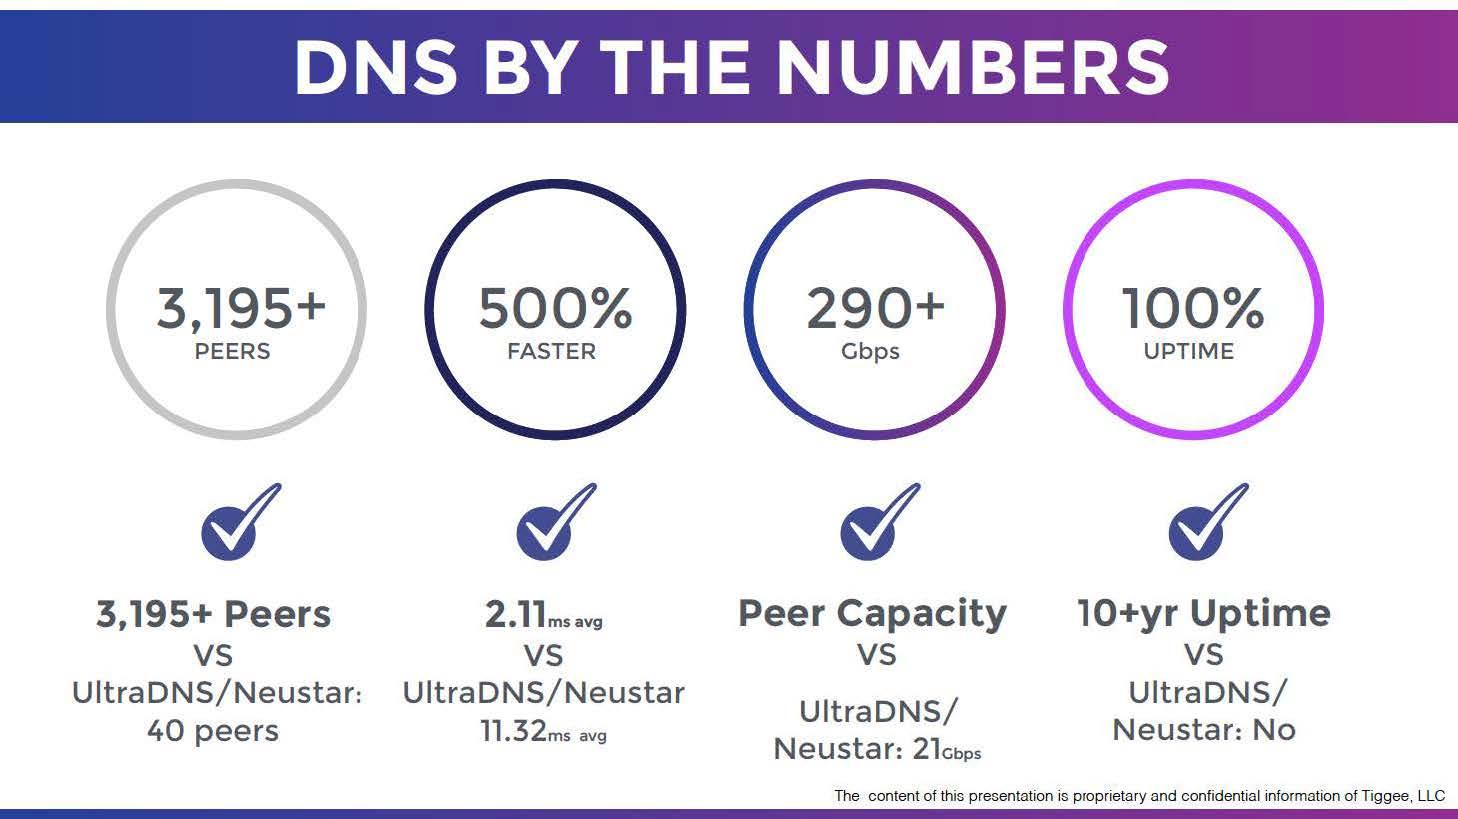 UltraDNS / Neustar DNS Performance Comparison